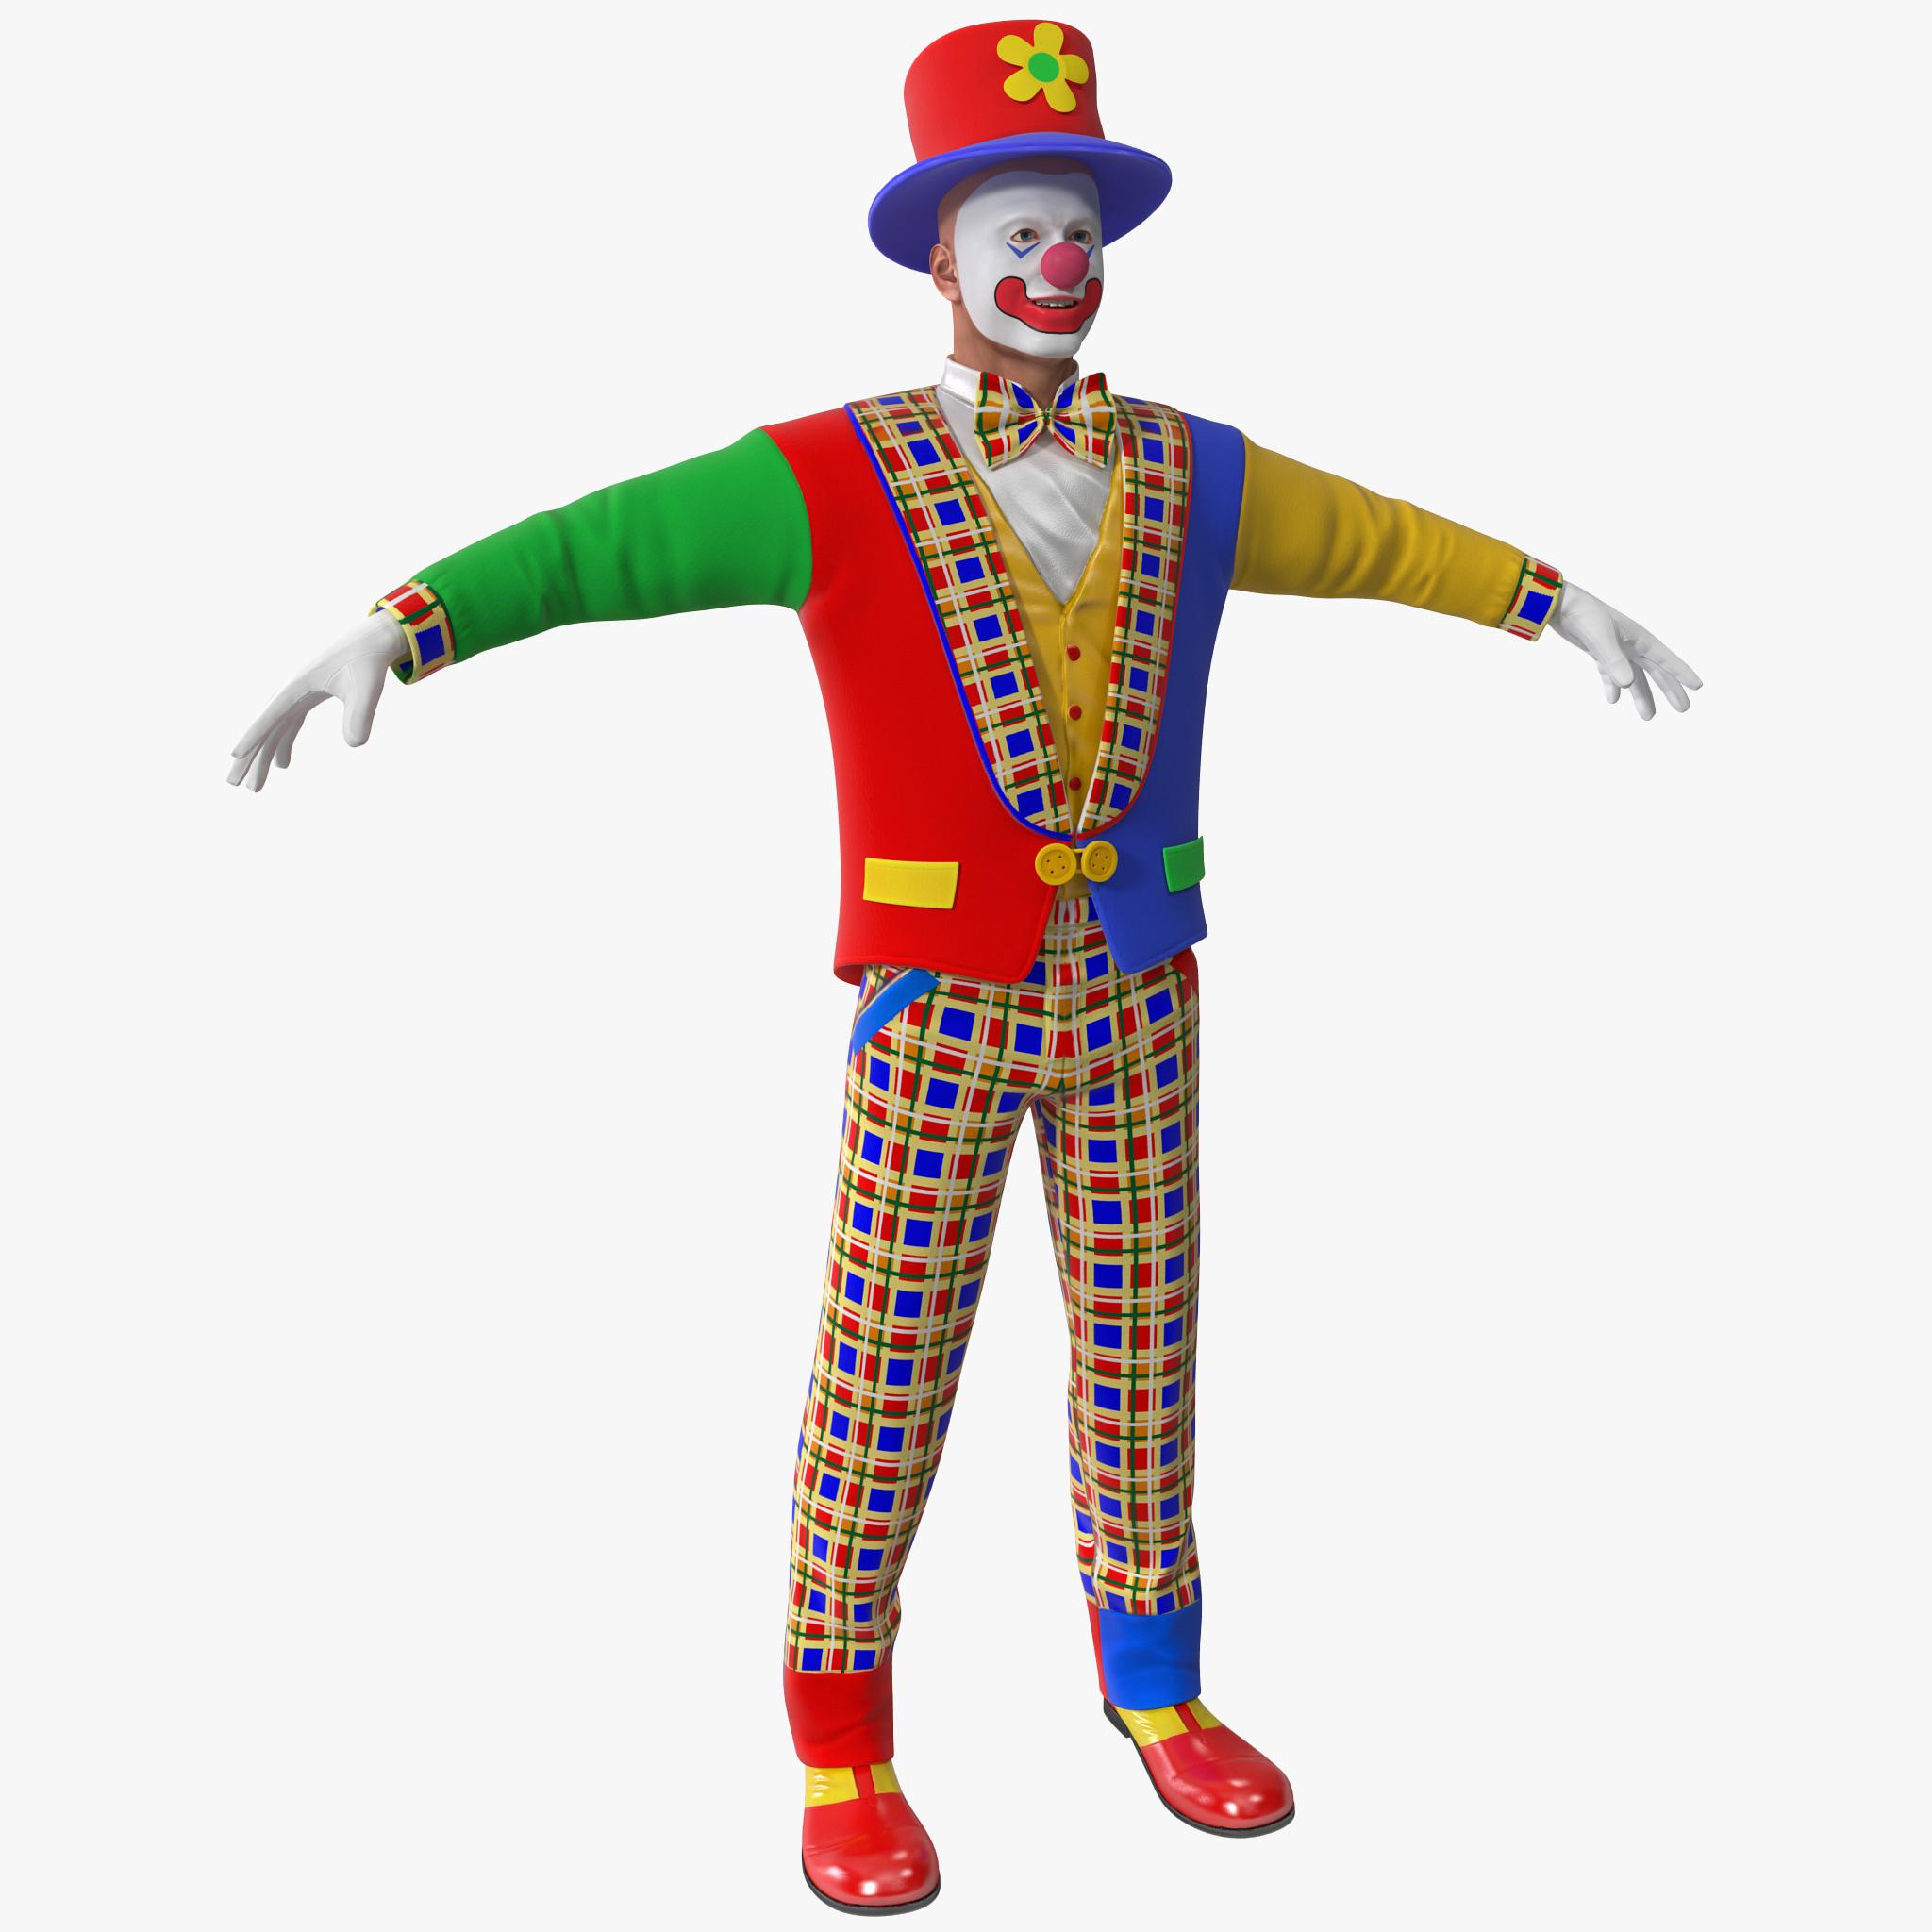 Clown 2 Rigged_1.jpg